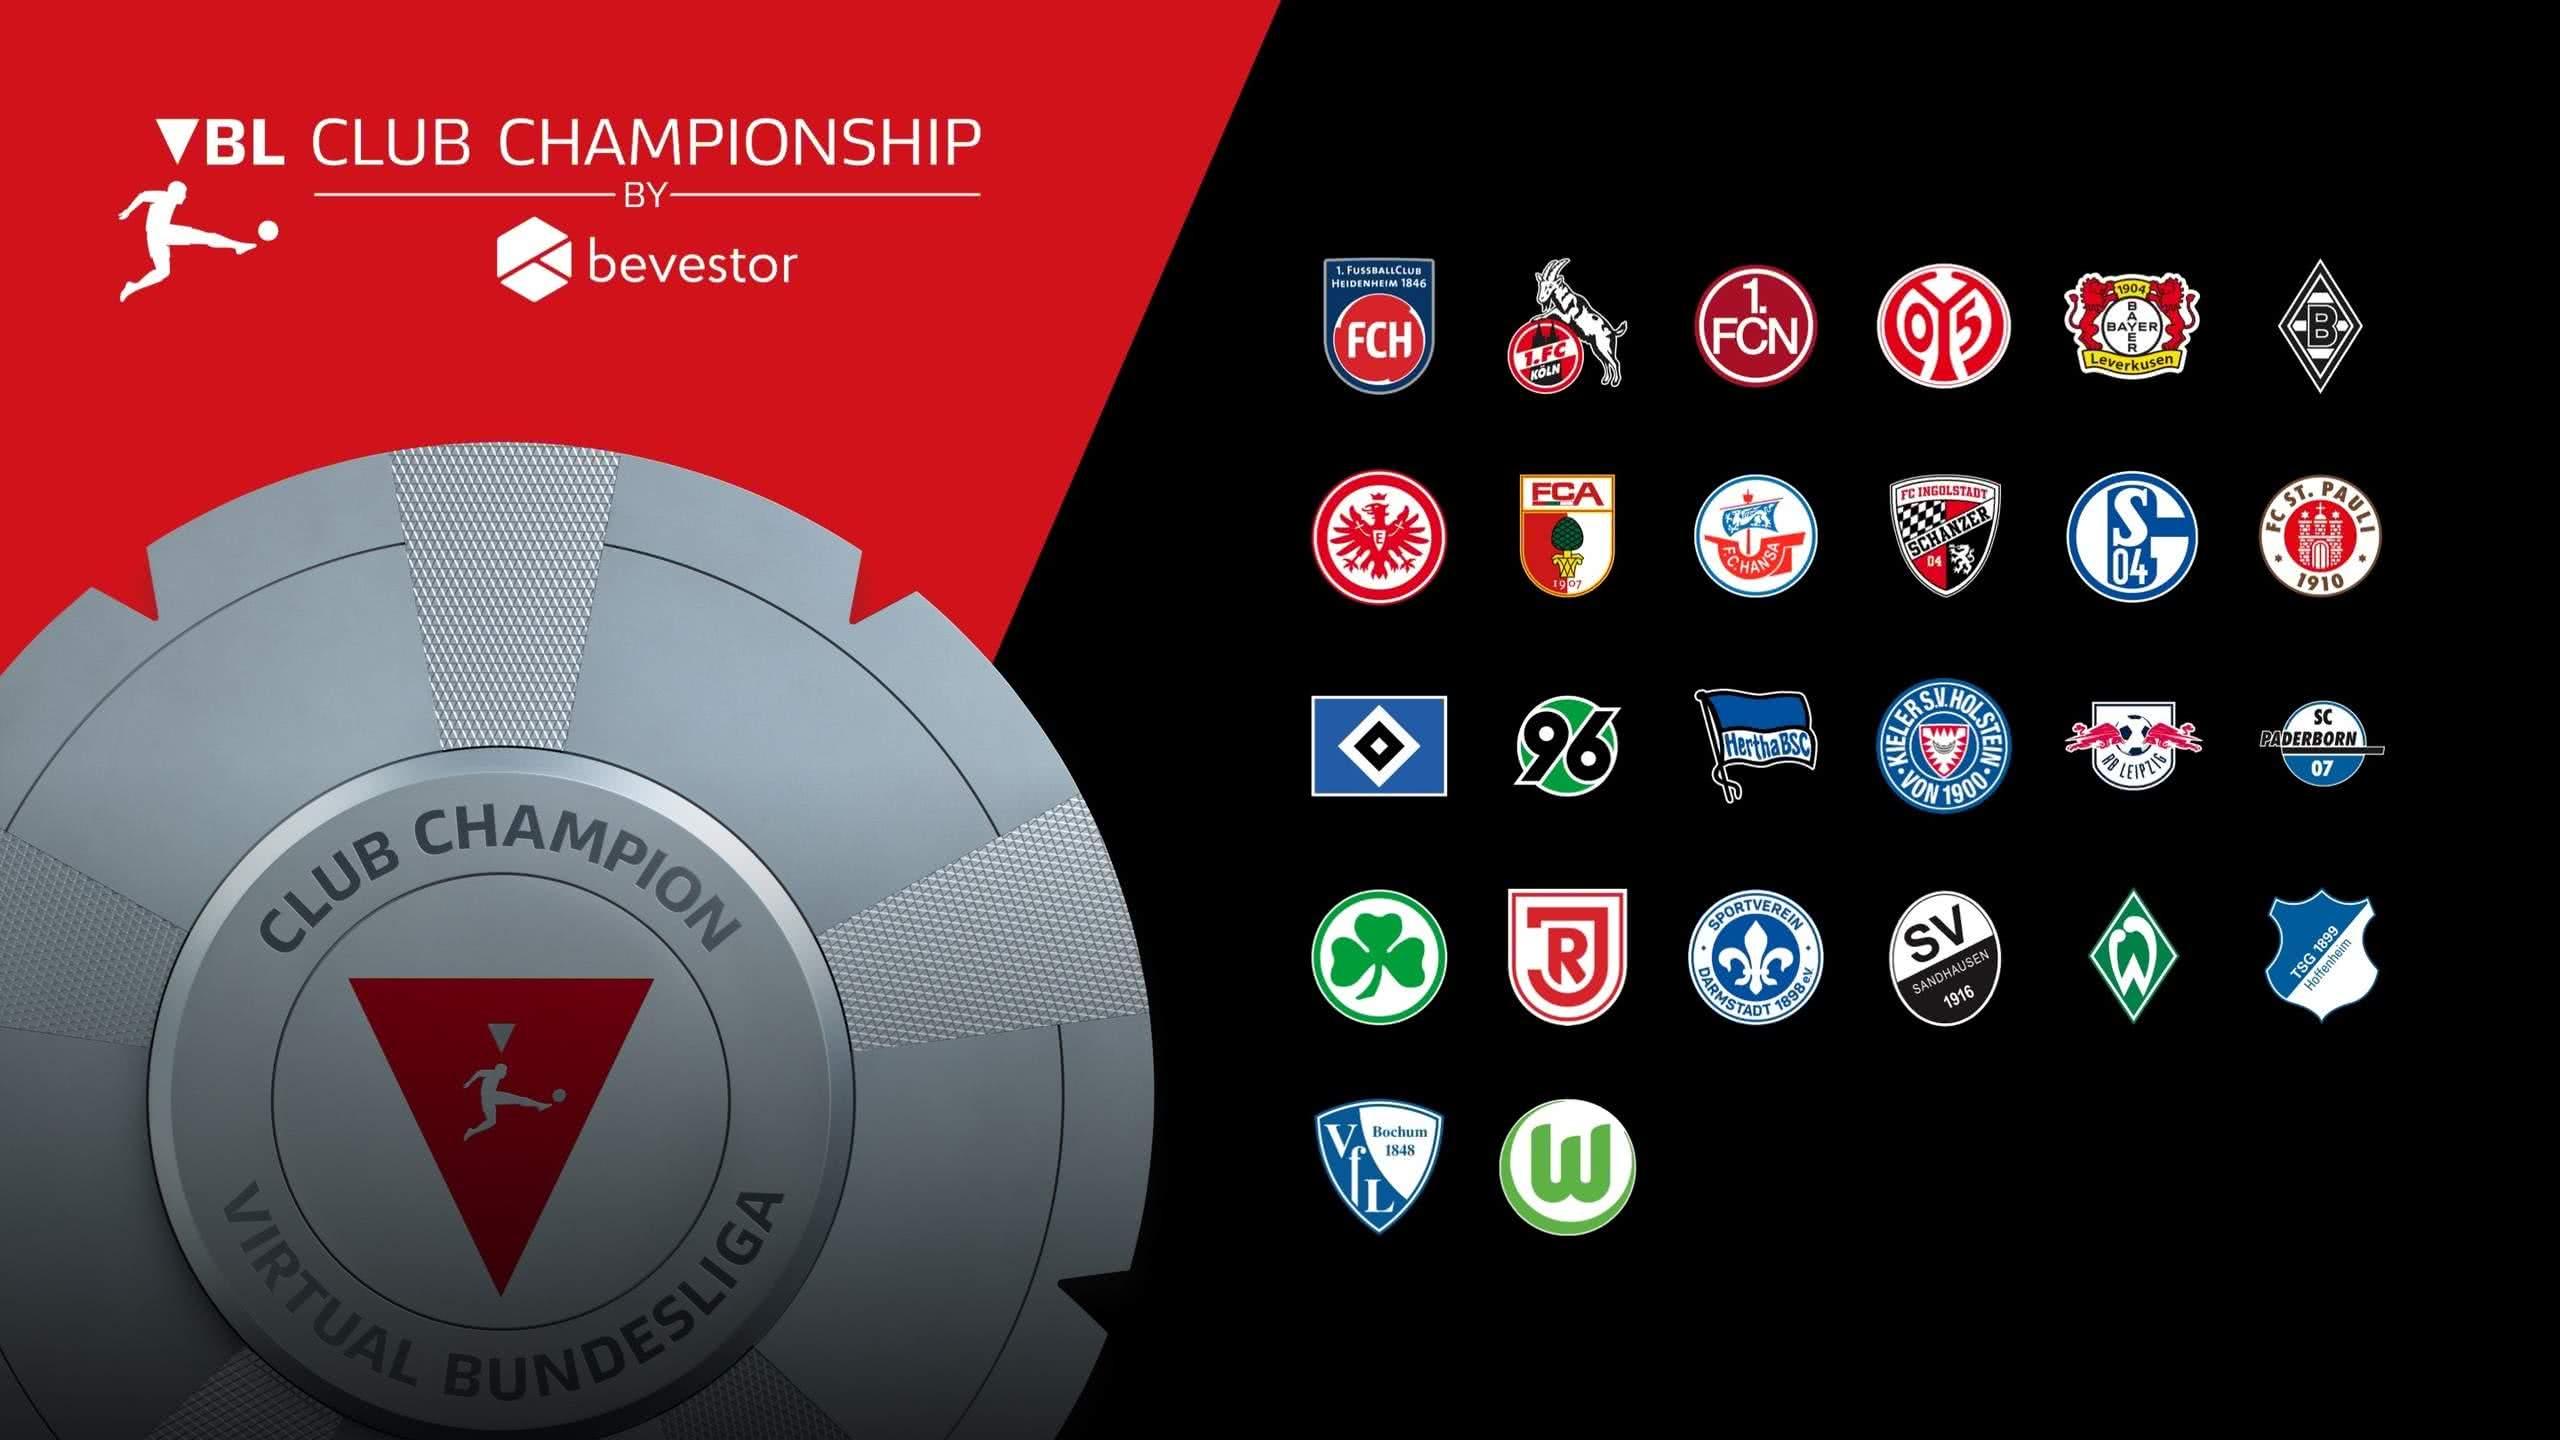 FIFA22: VBL Club Championship beginnt am 9. November